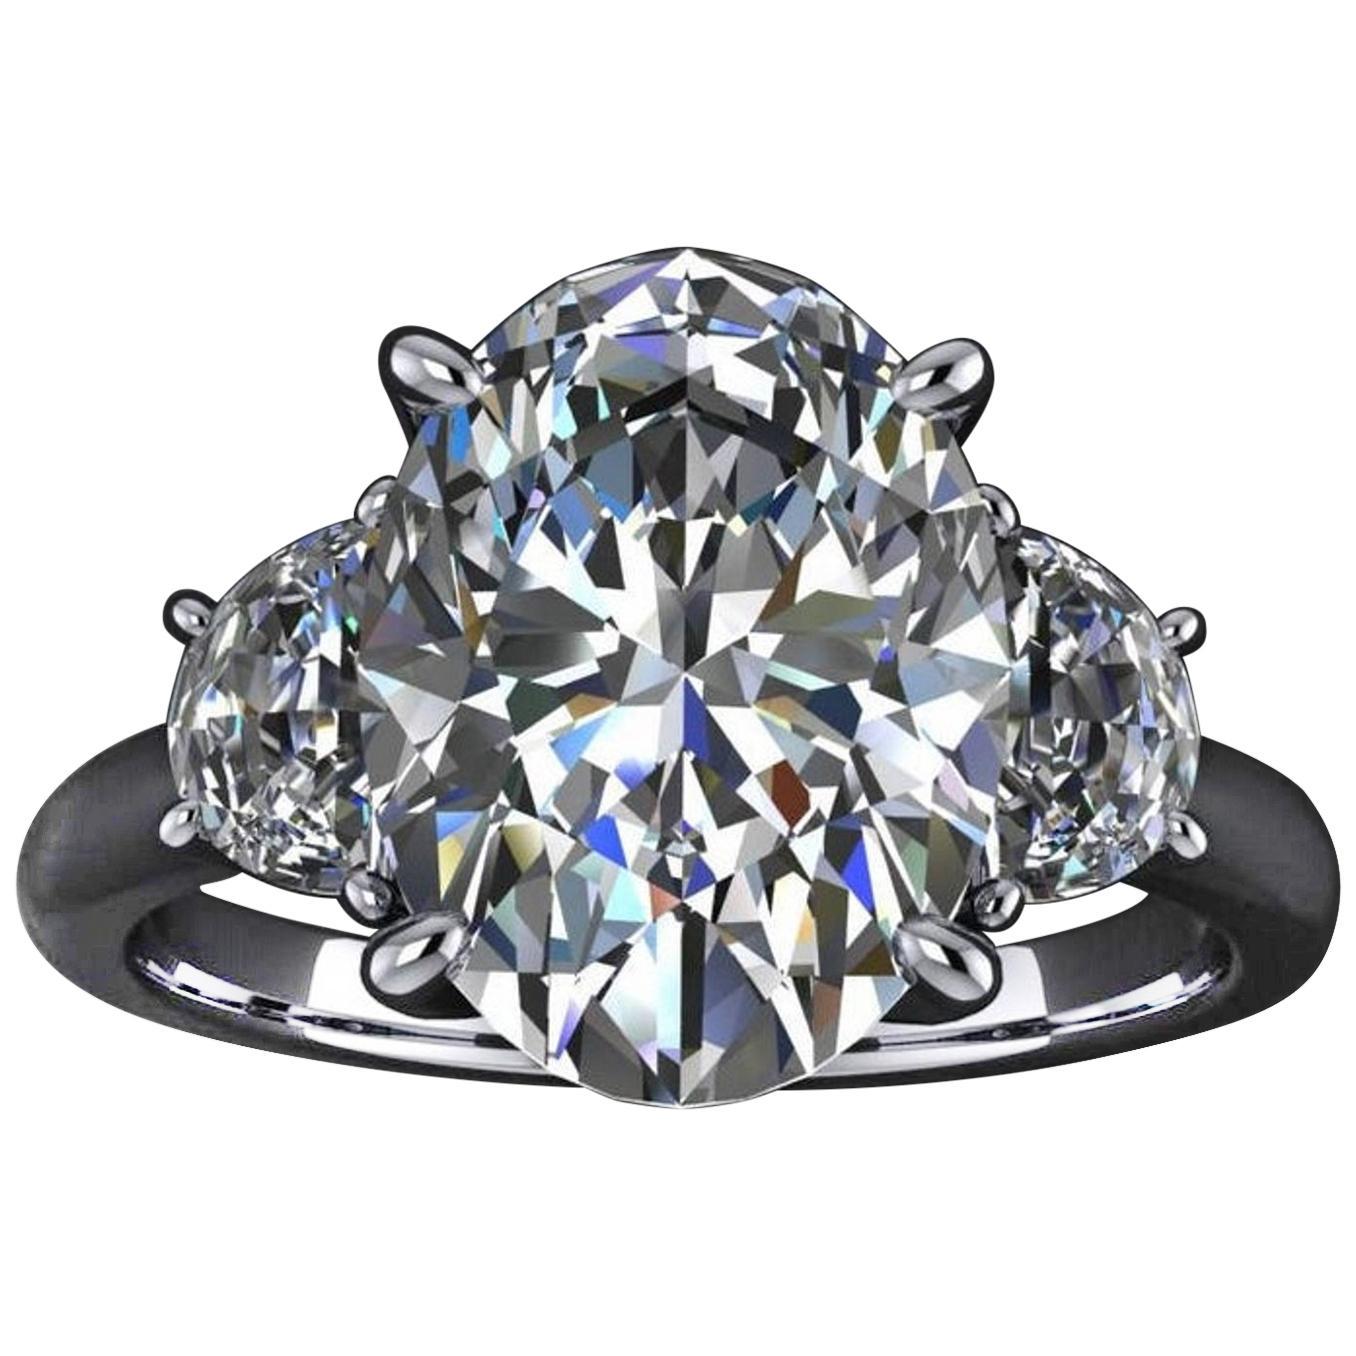 GIA Certified 4.75 Carat Oval Diamond 100% Eye Clean Ring